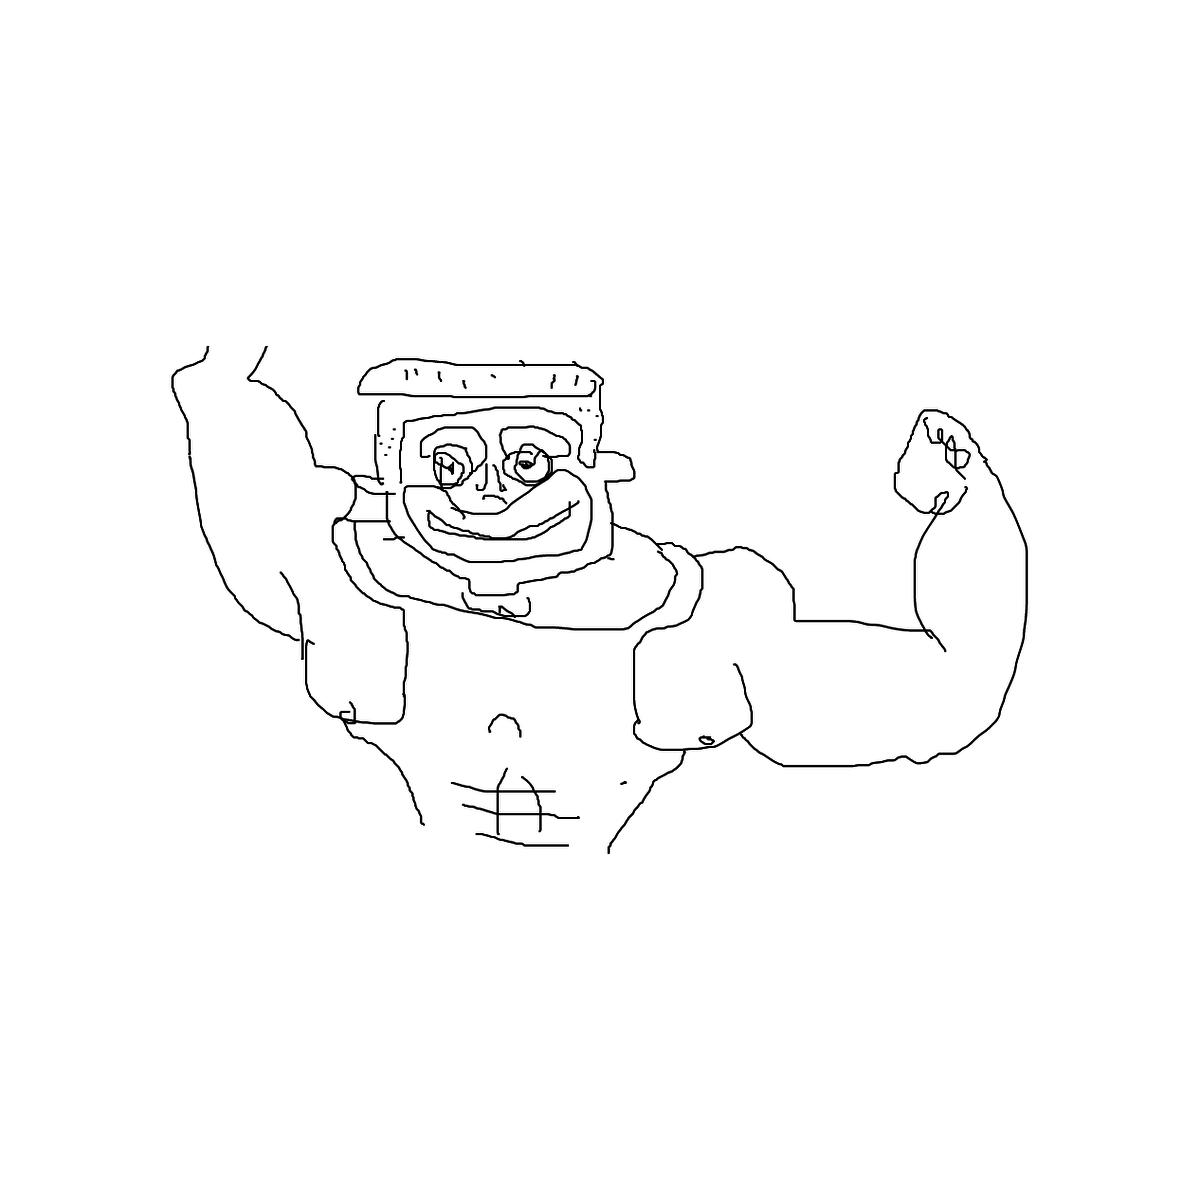 BAAAM drawing#648 lat:-45.0425910949707000lng: 169.1999359130859400